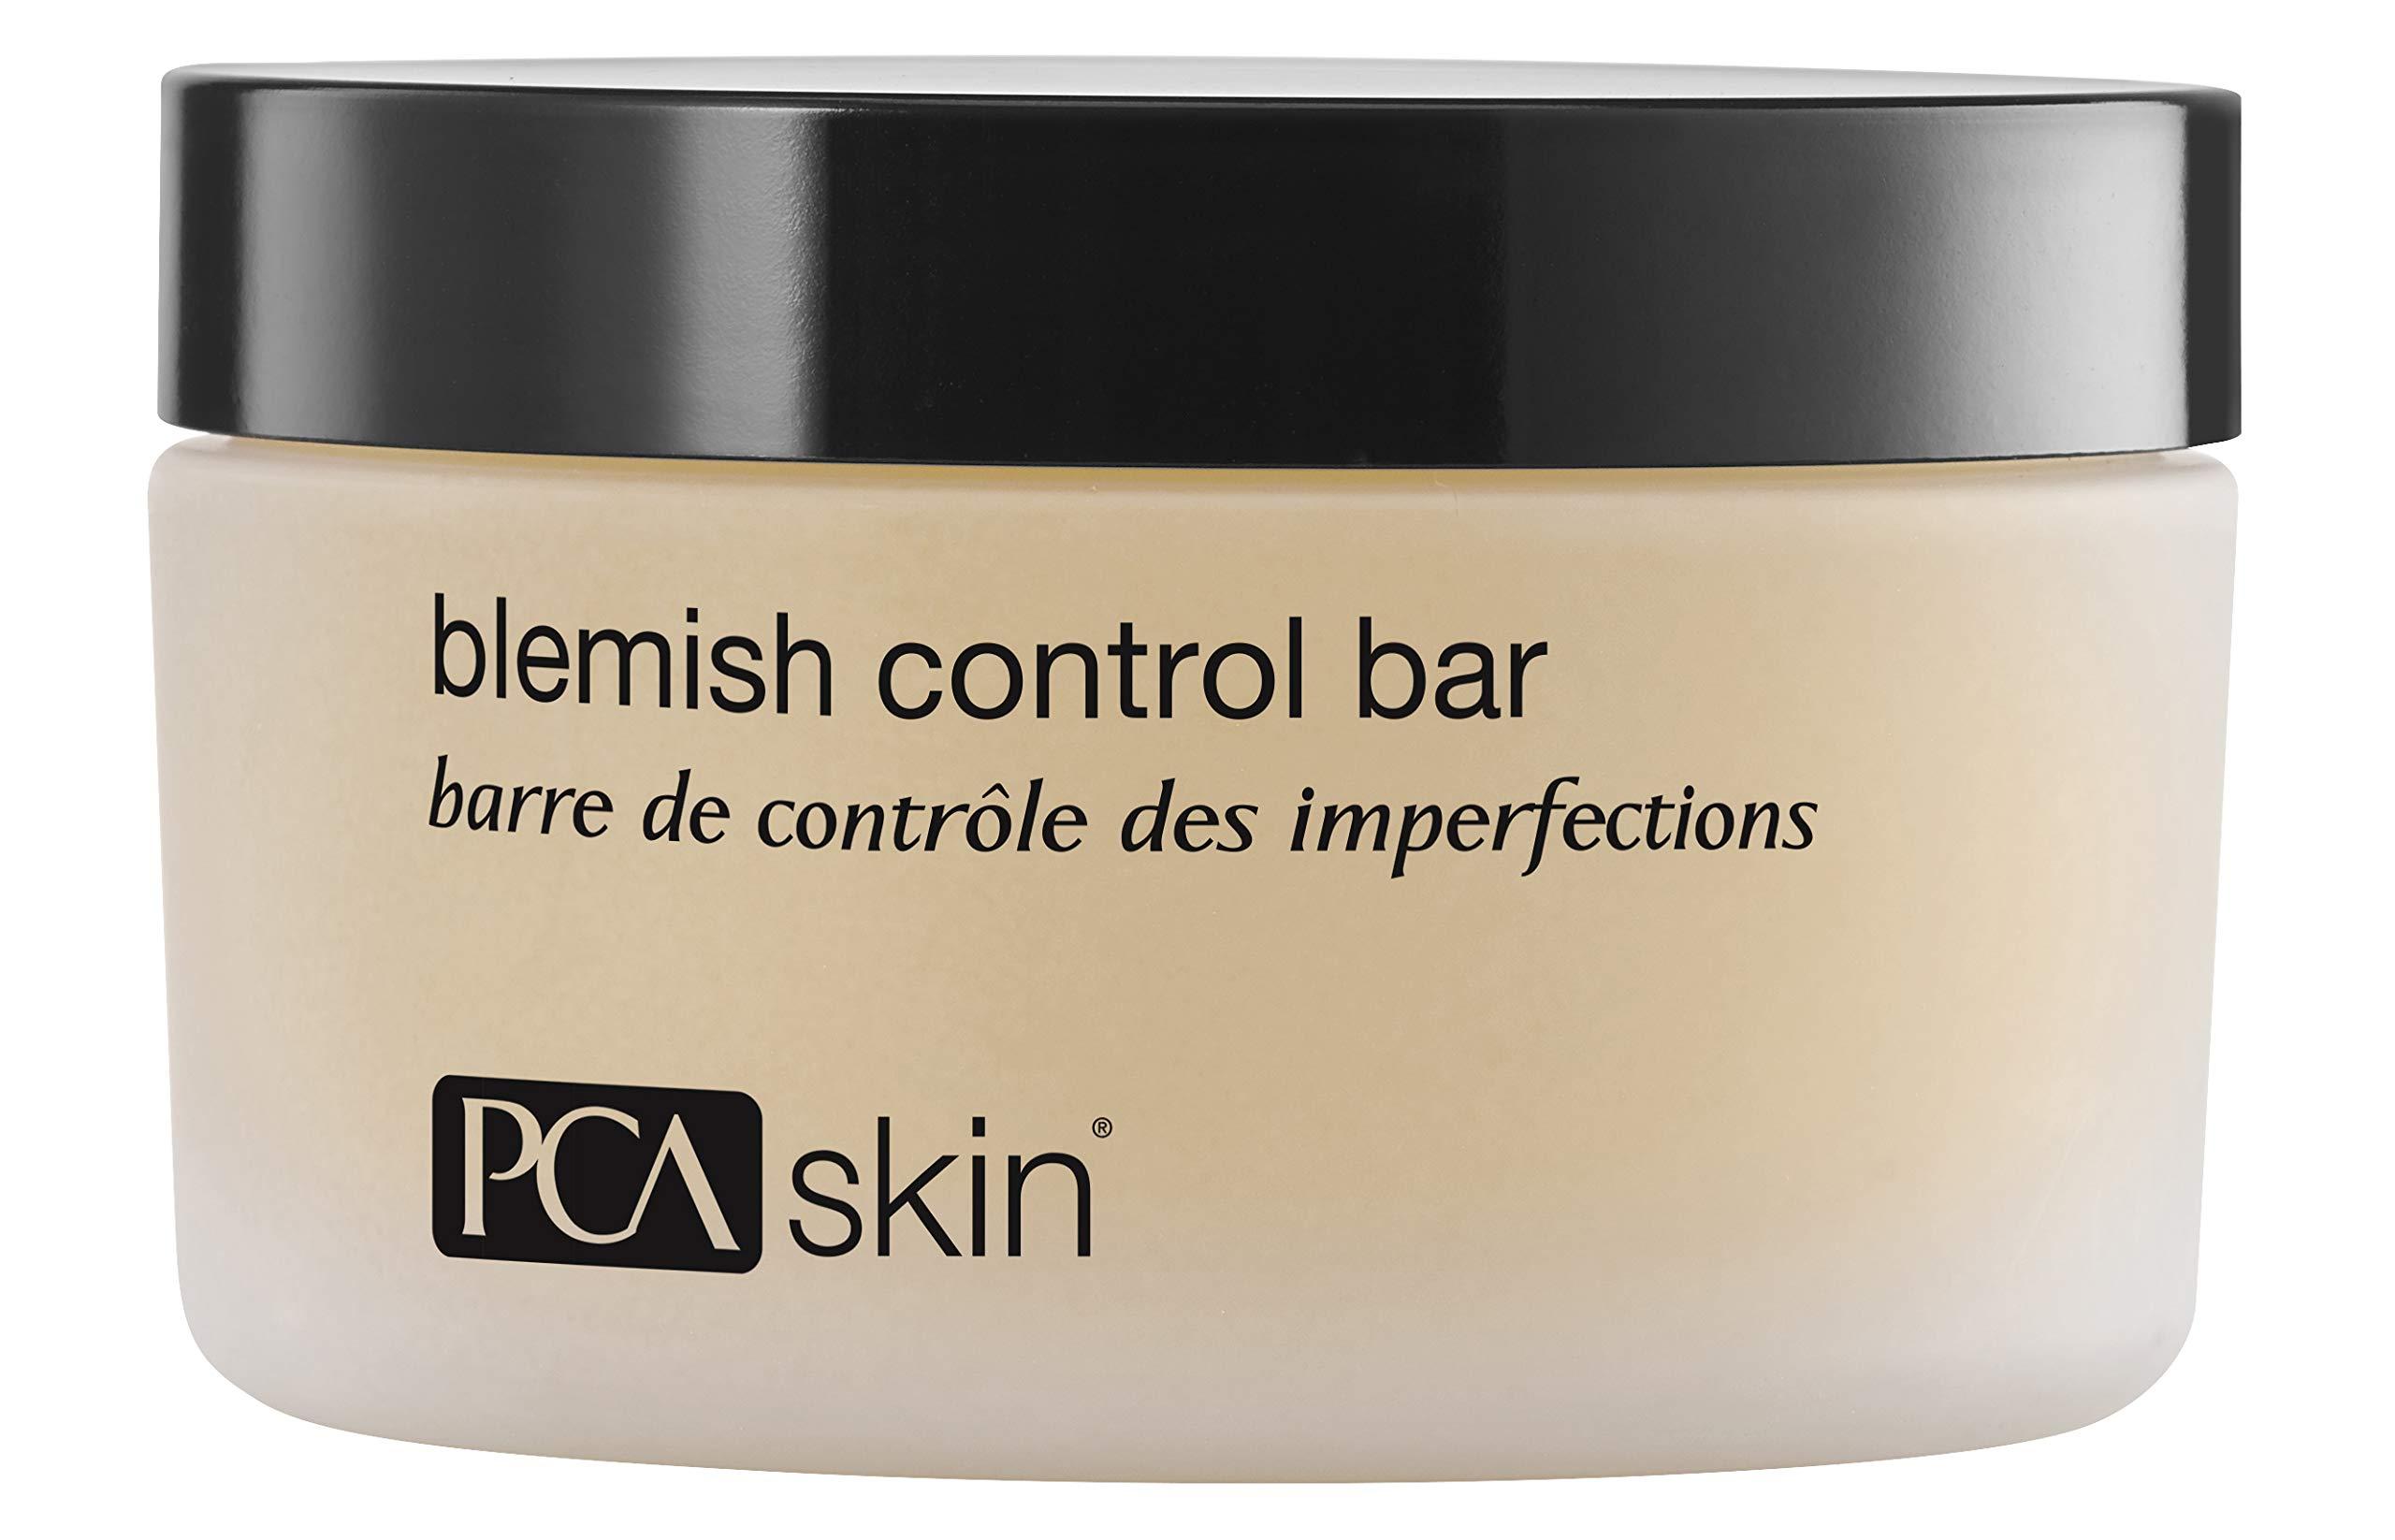 PCA SKIN Blemish Control Bar, Salicylic Acid Face & Body Treatment, 3.2 fluid ounce by PCA SKIN